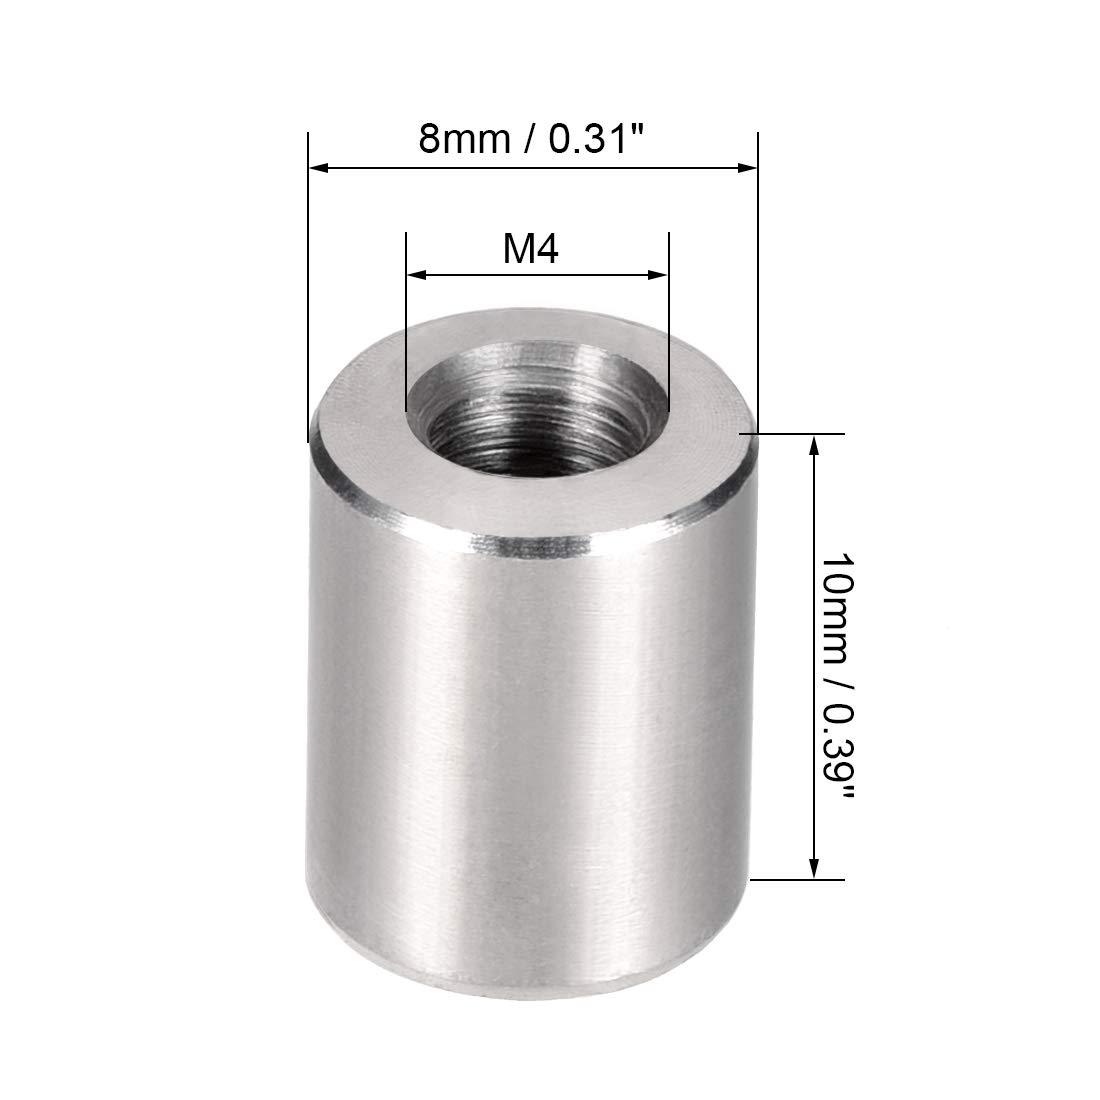 sourcing map Tuerca conector redondas M5x12mm de altura del manguito tuerca de v/ástago de acero inoxidable 304 10 pzas